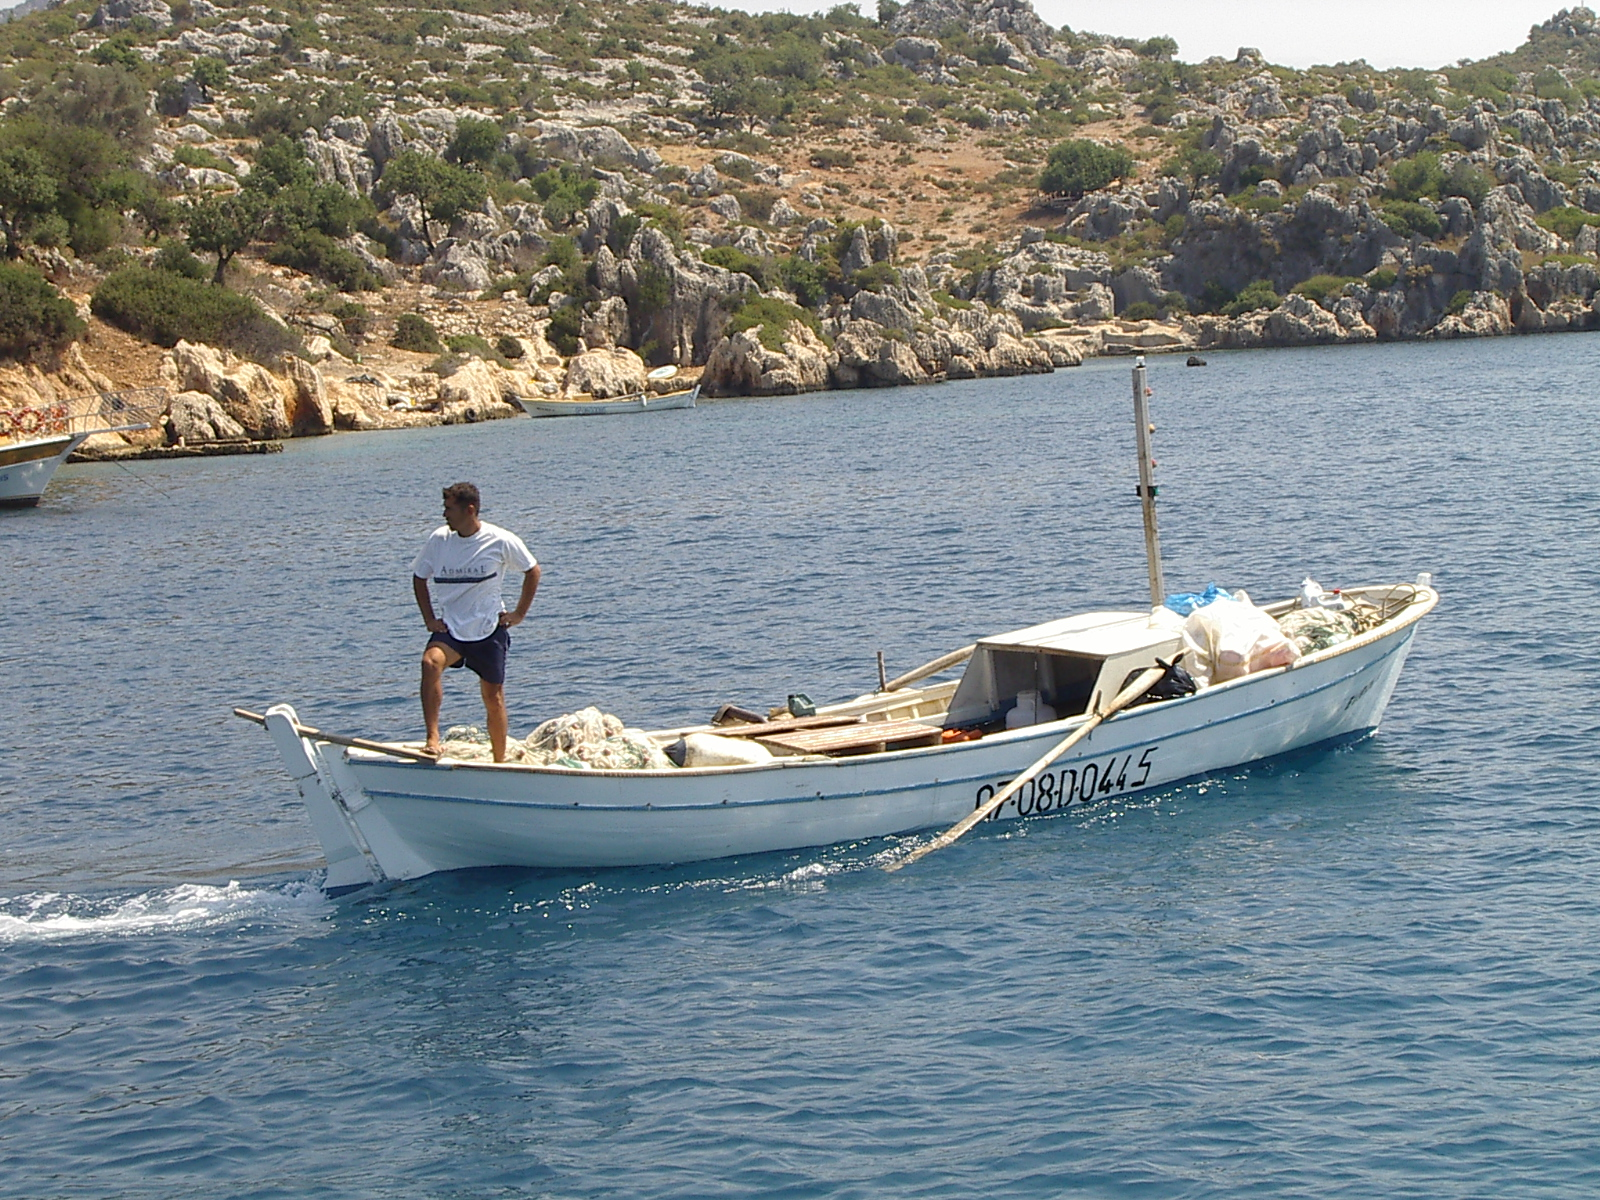 j_d fishers boat fisherman sea shore rock